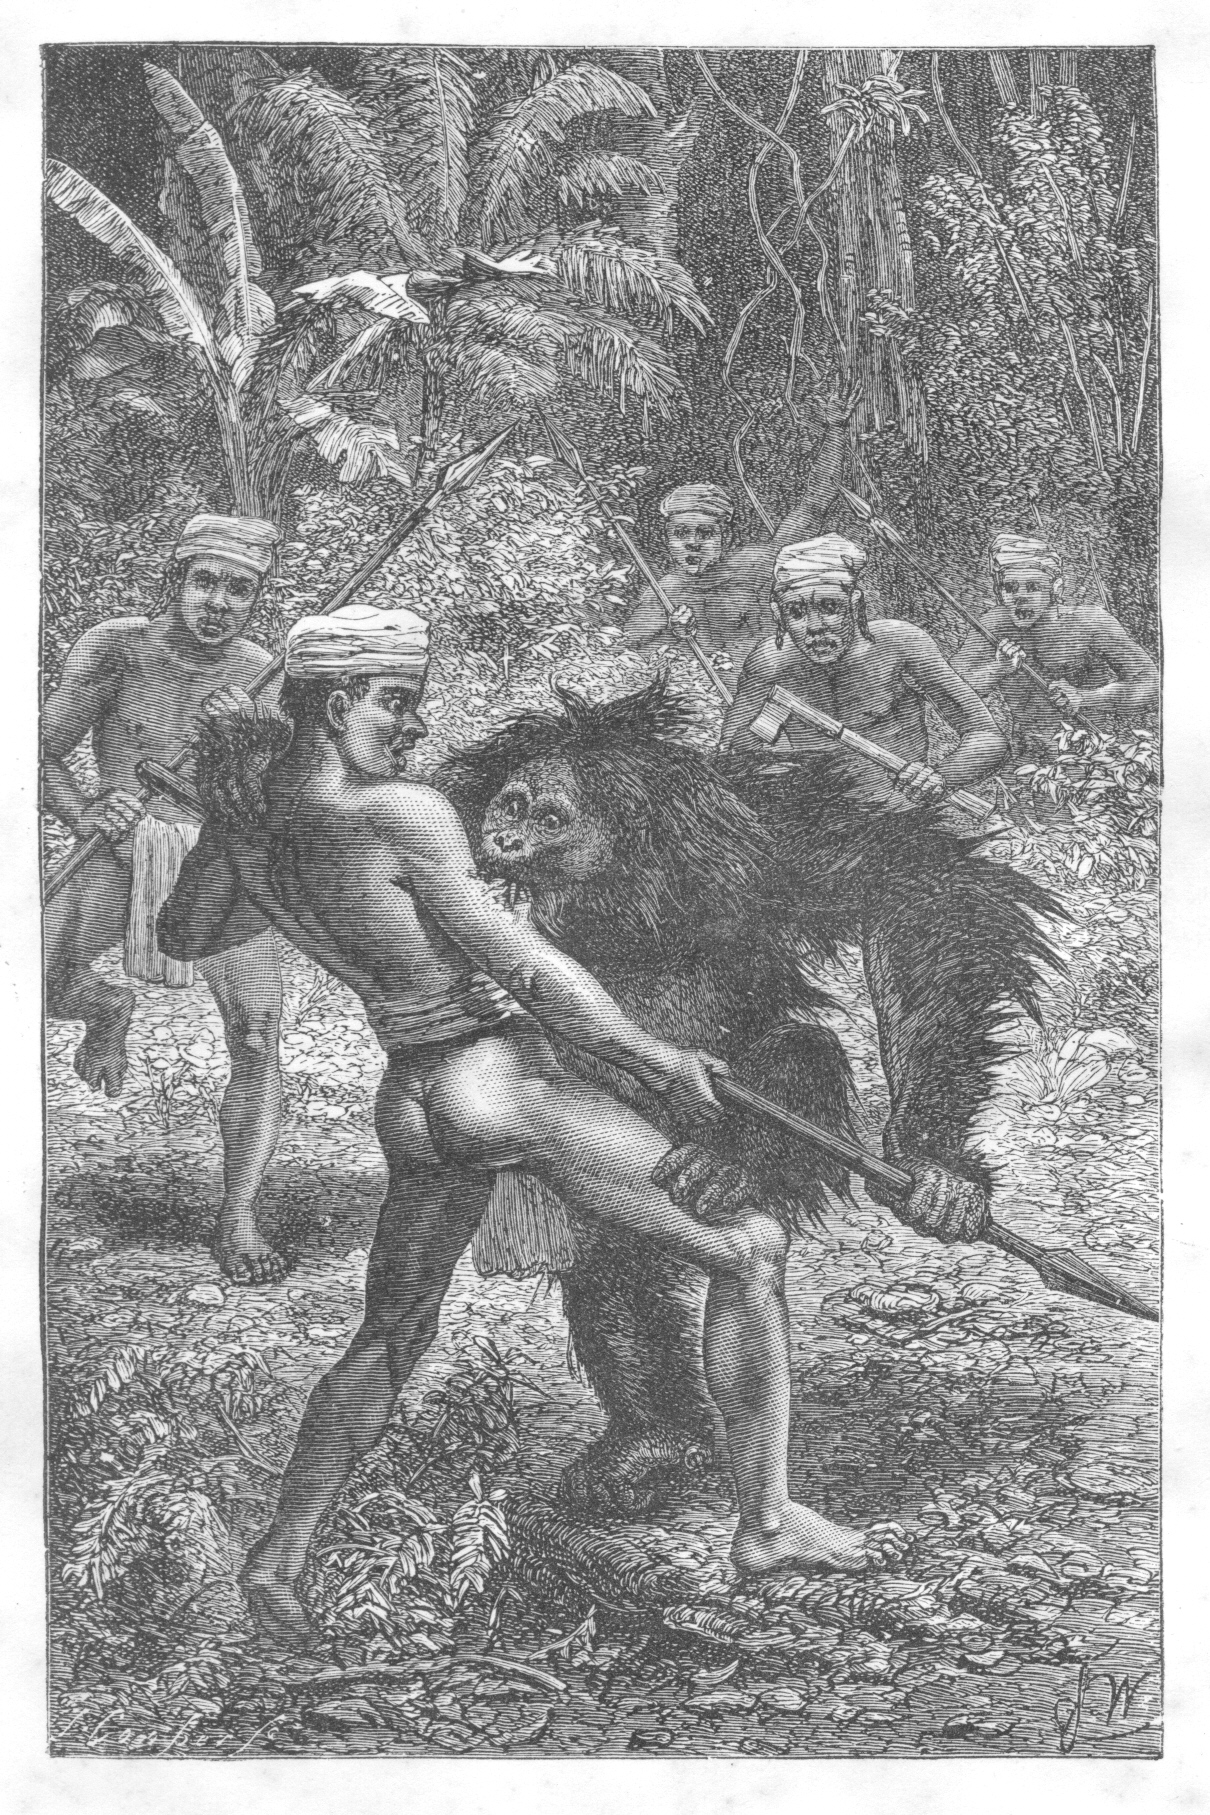 Orangutan-human hentai xxx pictures